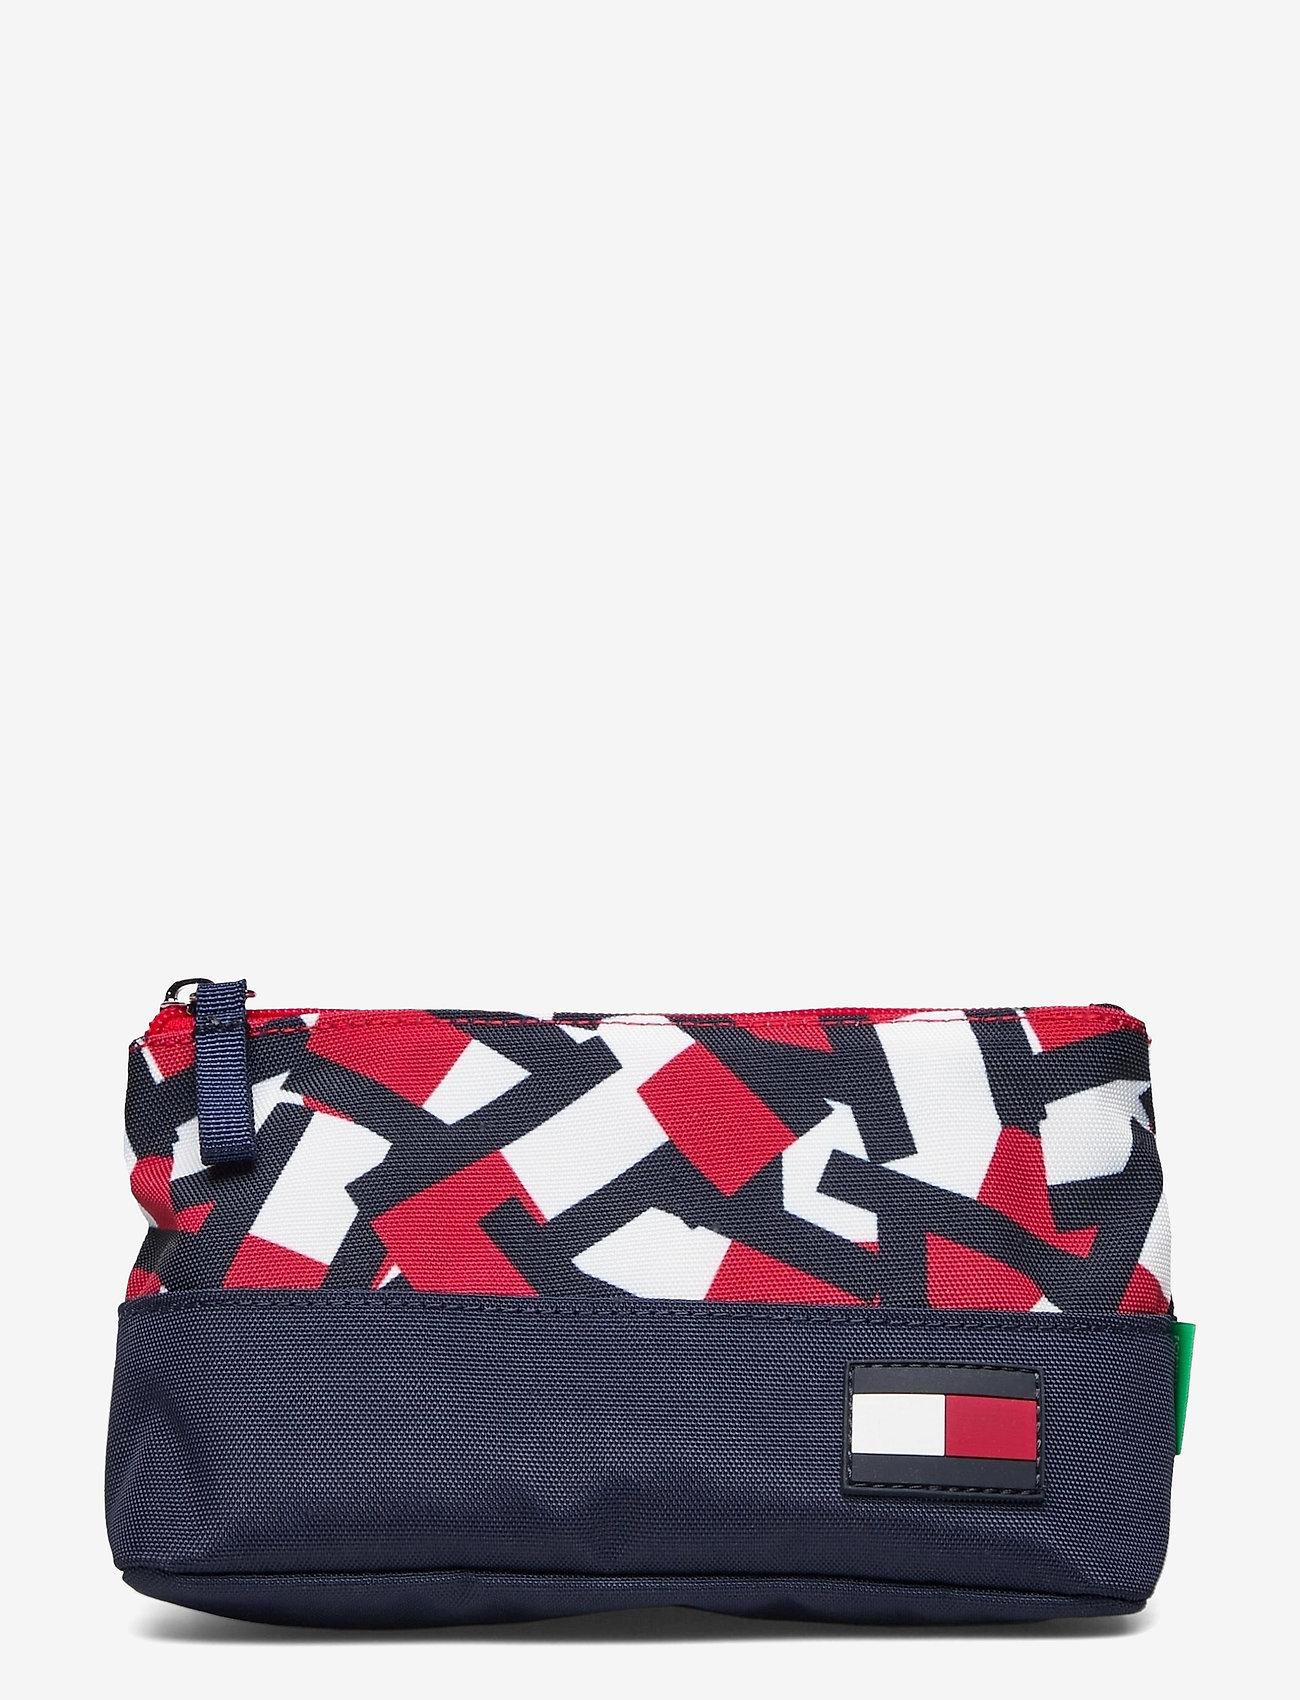 Tommy Hilfiger - BTS CORE PENCIL CASE FLAG PRINT - accessories - flag print colorblock - 0